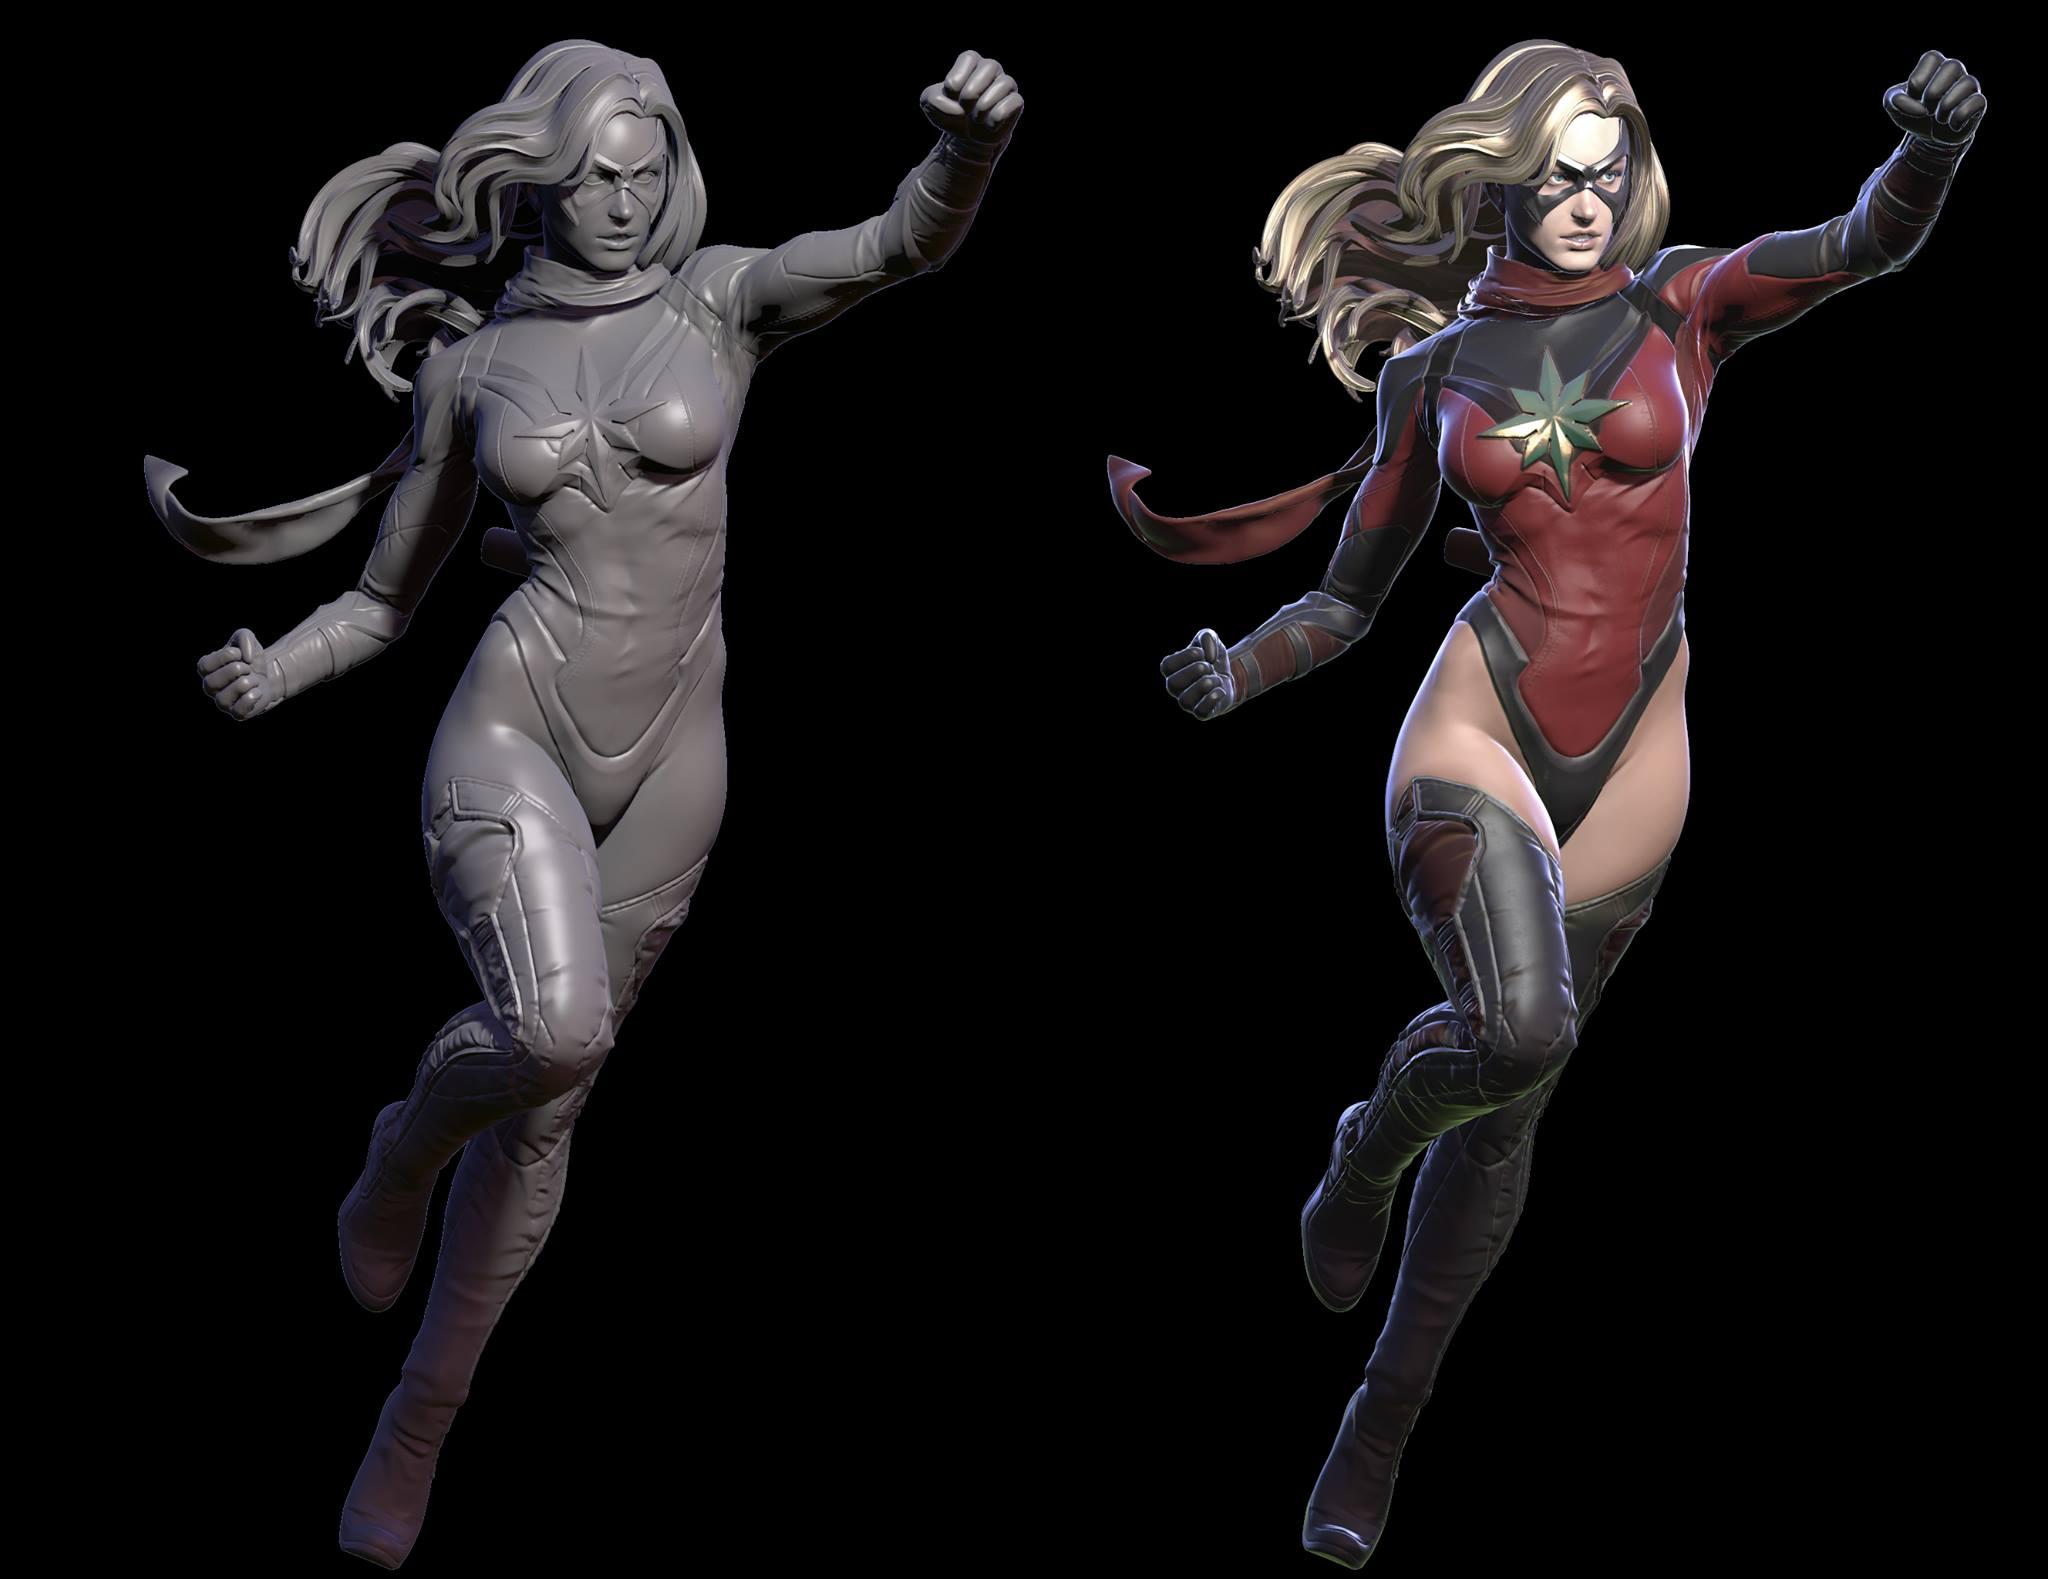 Premium Collectibles : Ms Marvel - Comics Version 1759031038227914243332211207068479797943333968534o